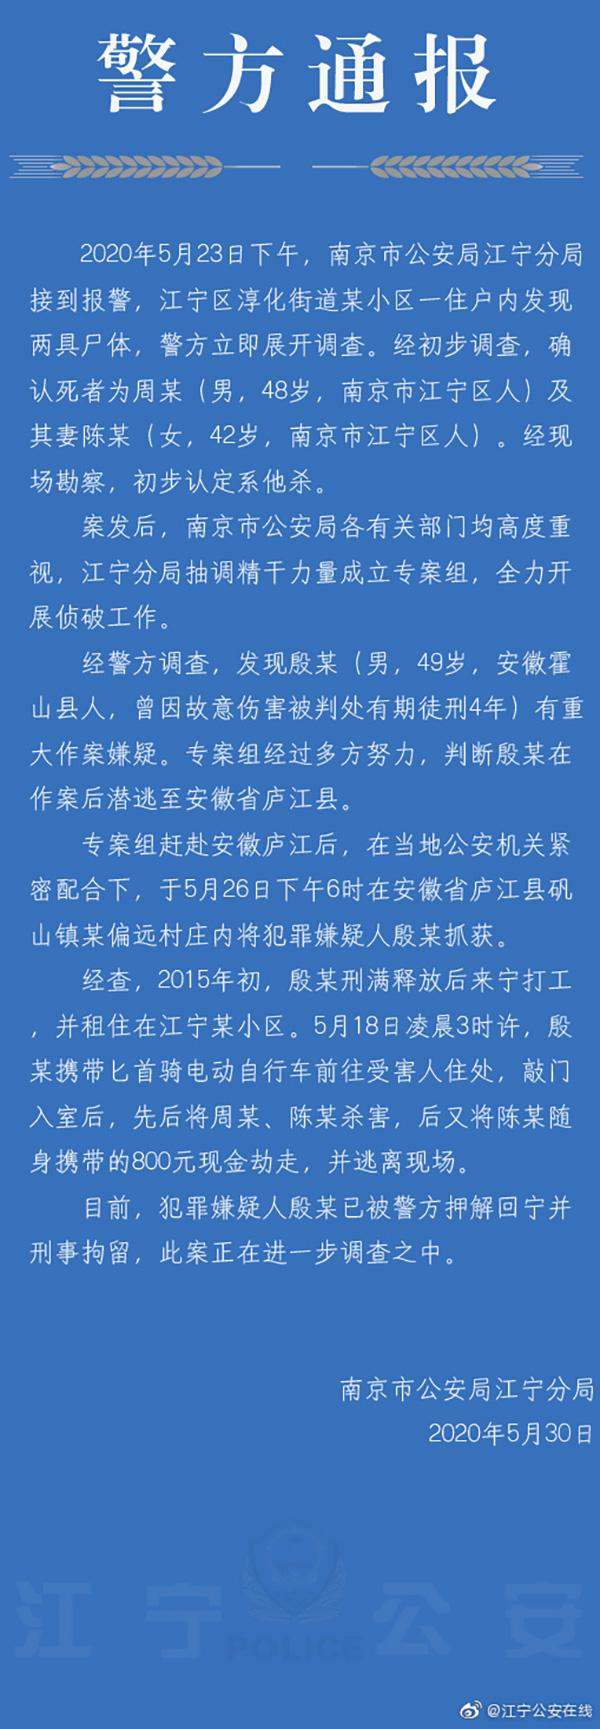 【mtgox】_南京警方:江宁一对夫妻被入室杀害拿走800元,嫌犯已抓获